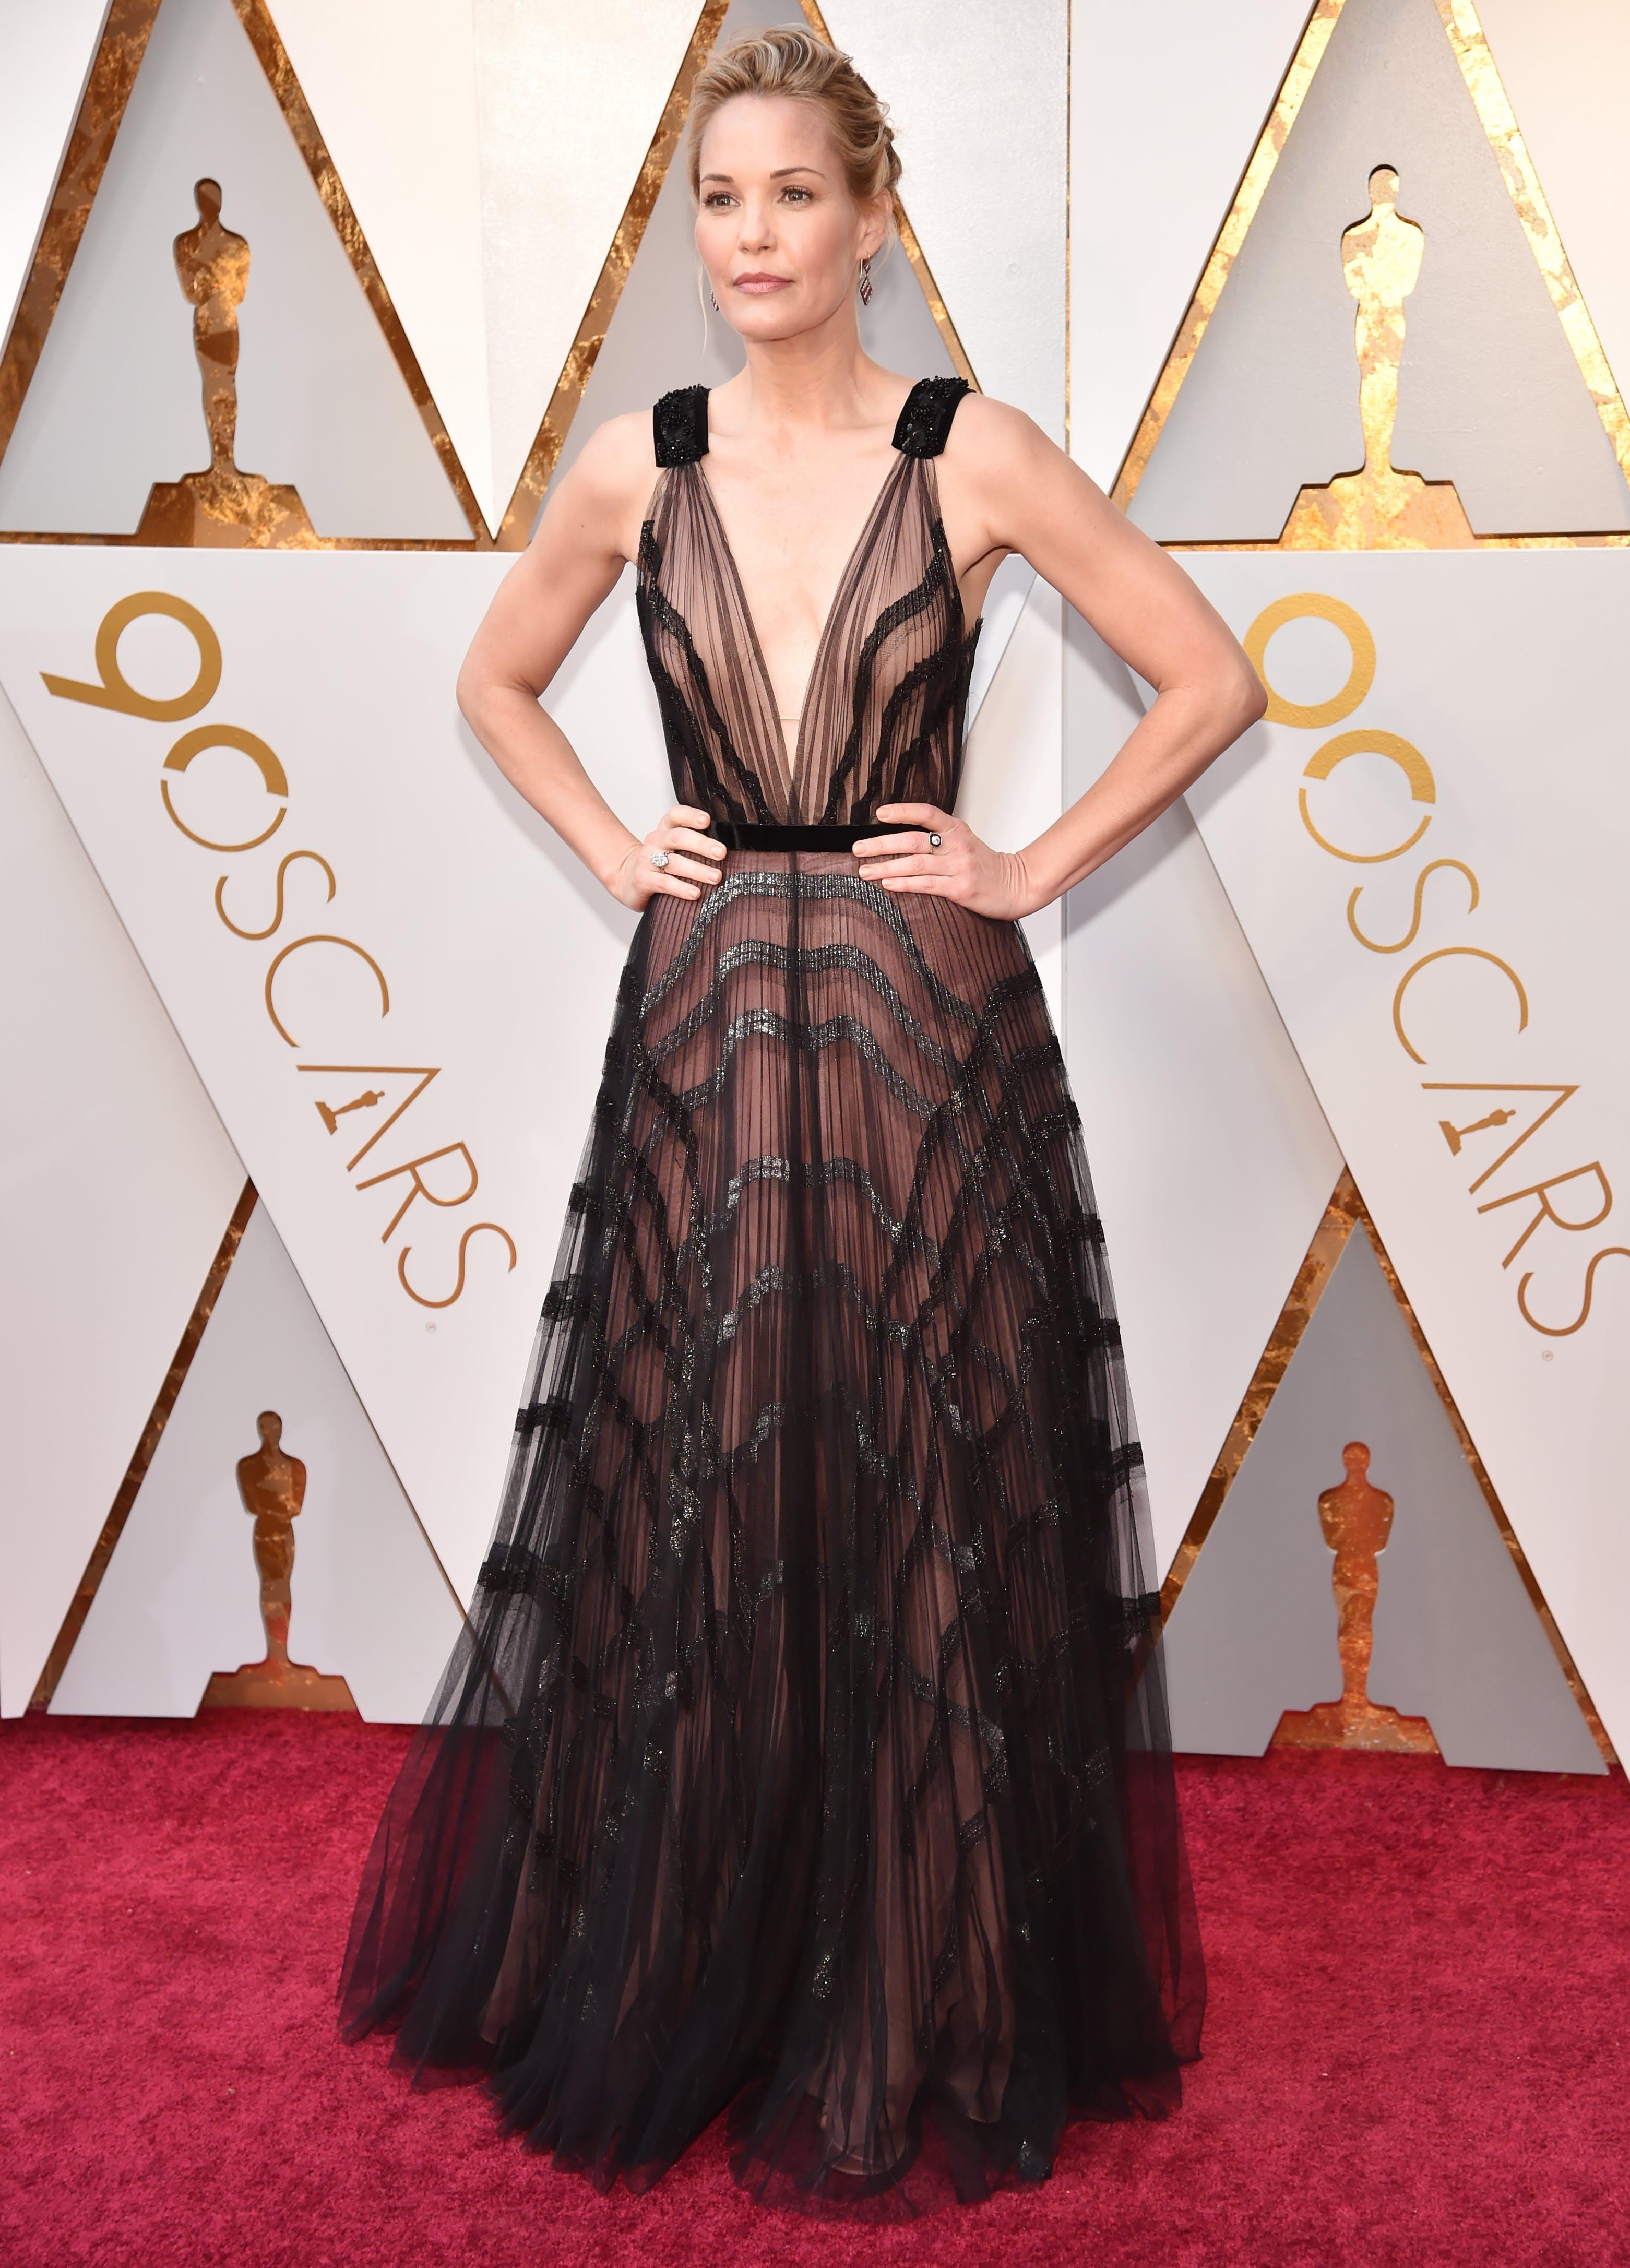 Leslie Bibb at the 2018 Oscars